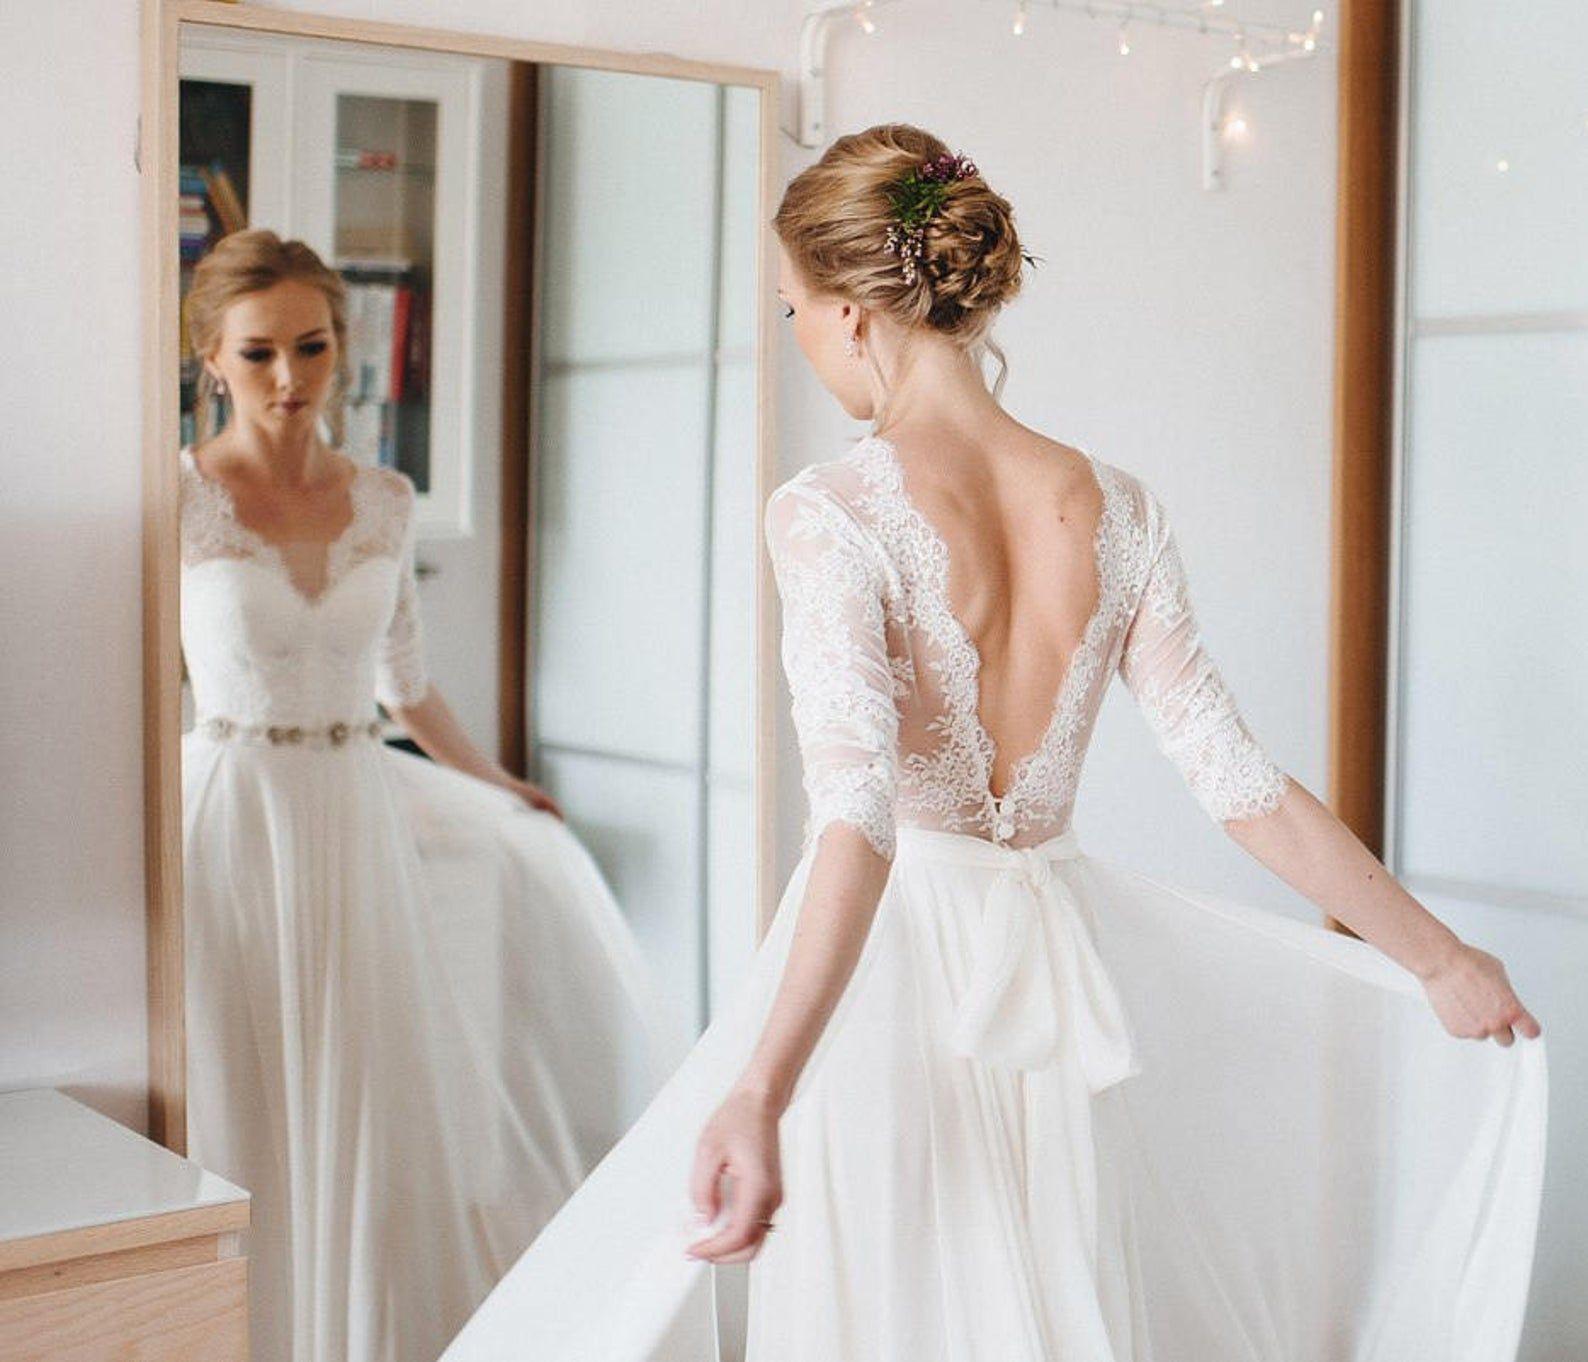 A Line Wedding Dress A Line Style Simple Wedding Dress Etsy In 2020 Elegant Wedding Dress Etsy Wedding Dress Wedding Dresses Simple